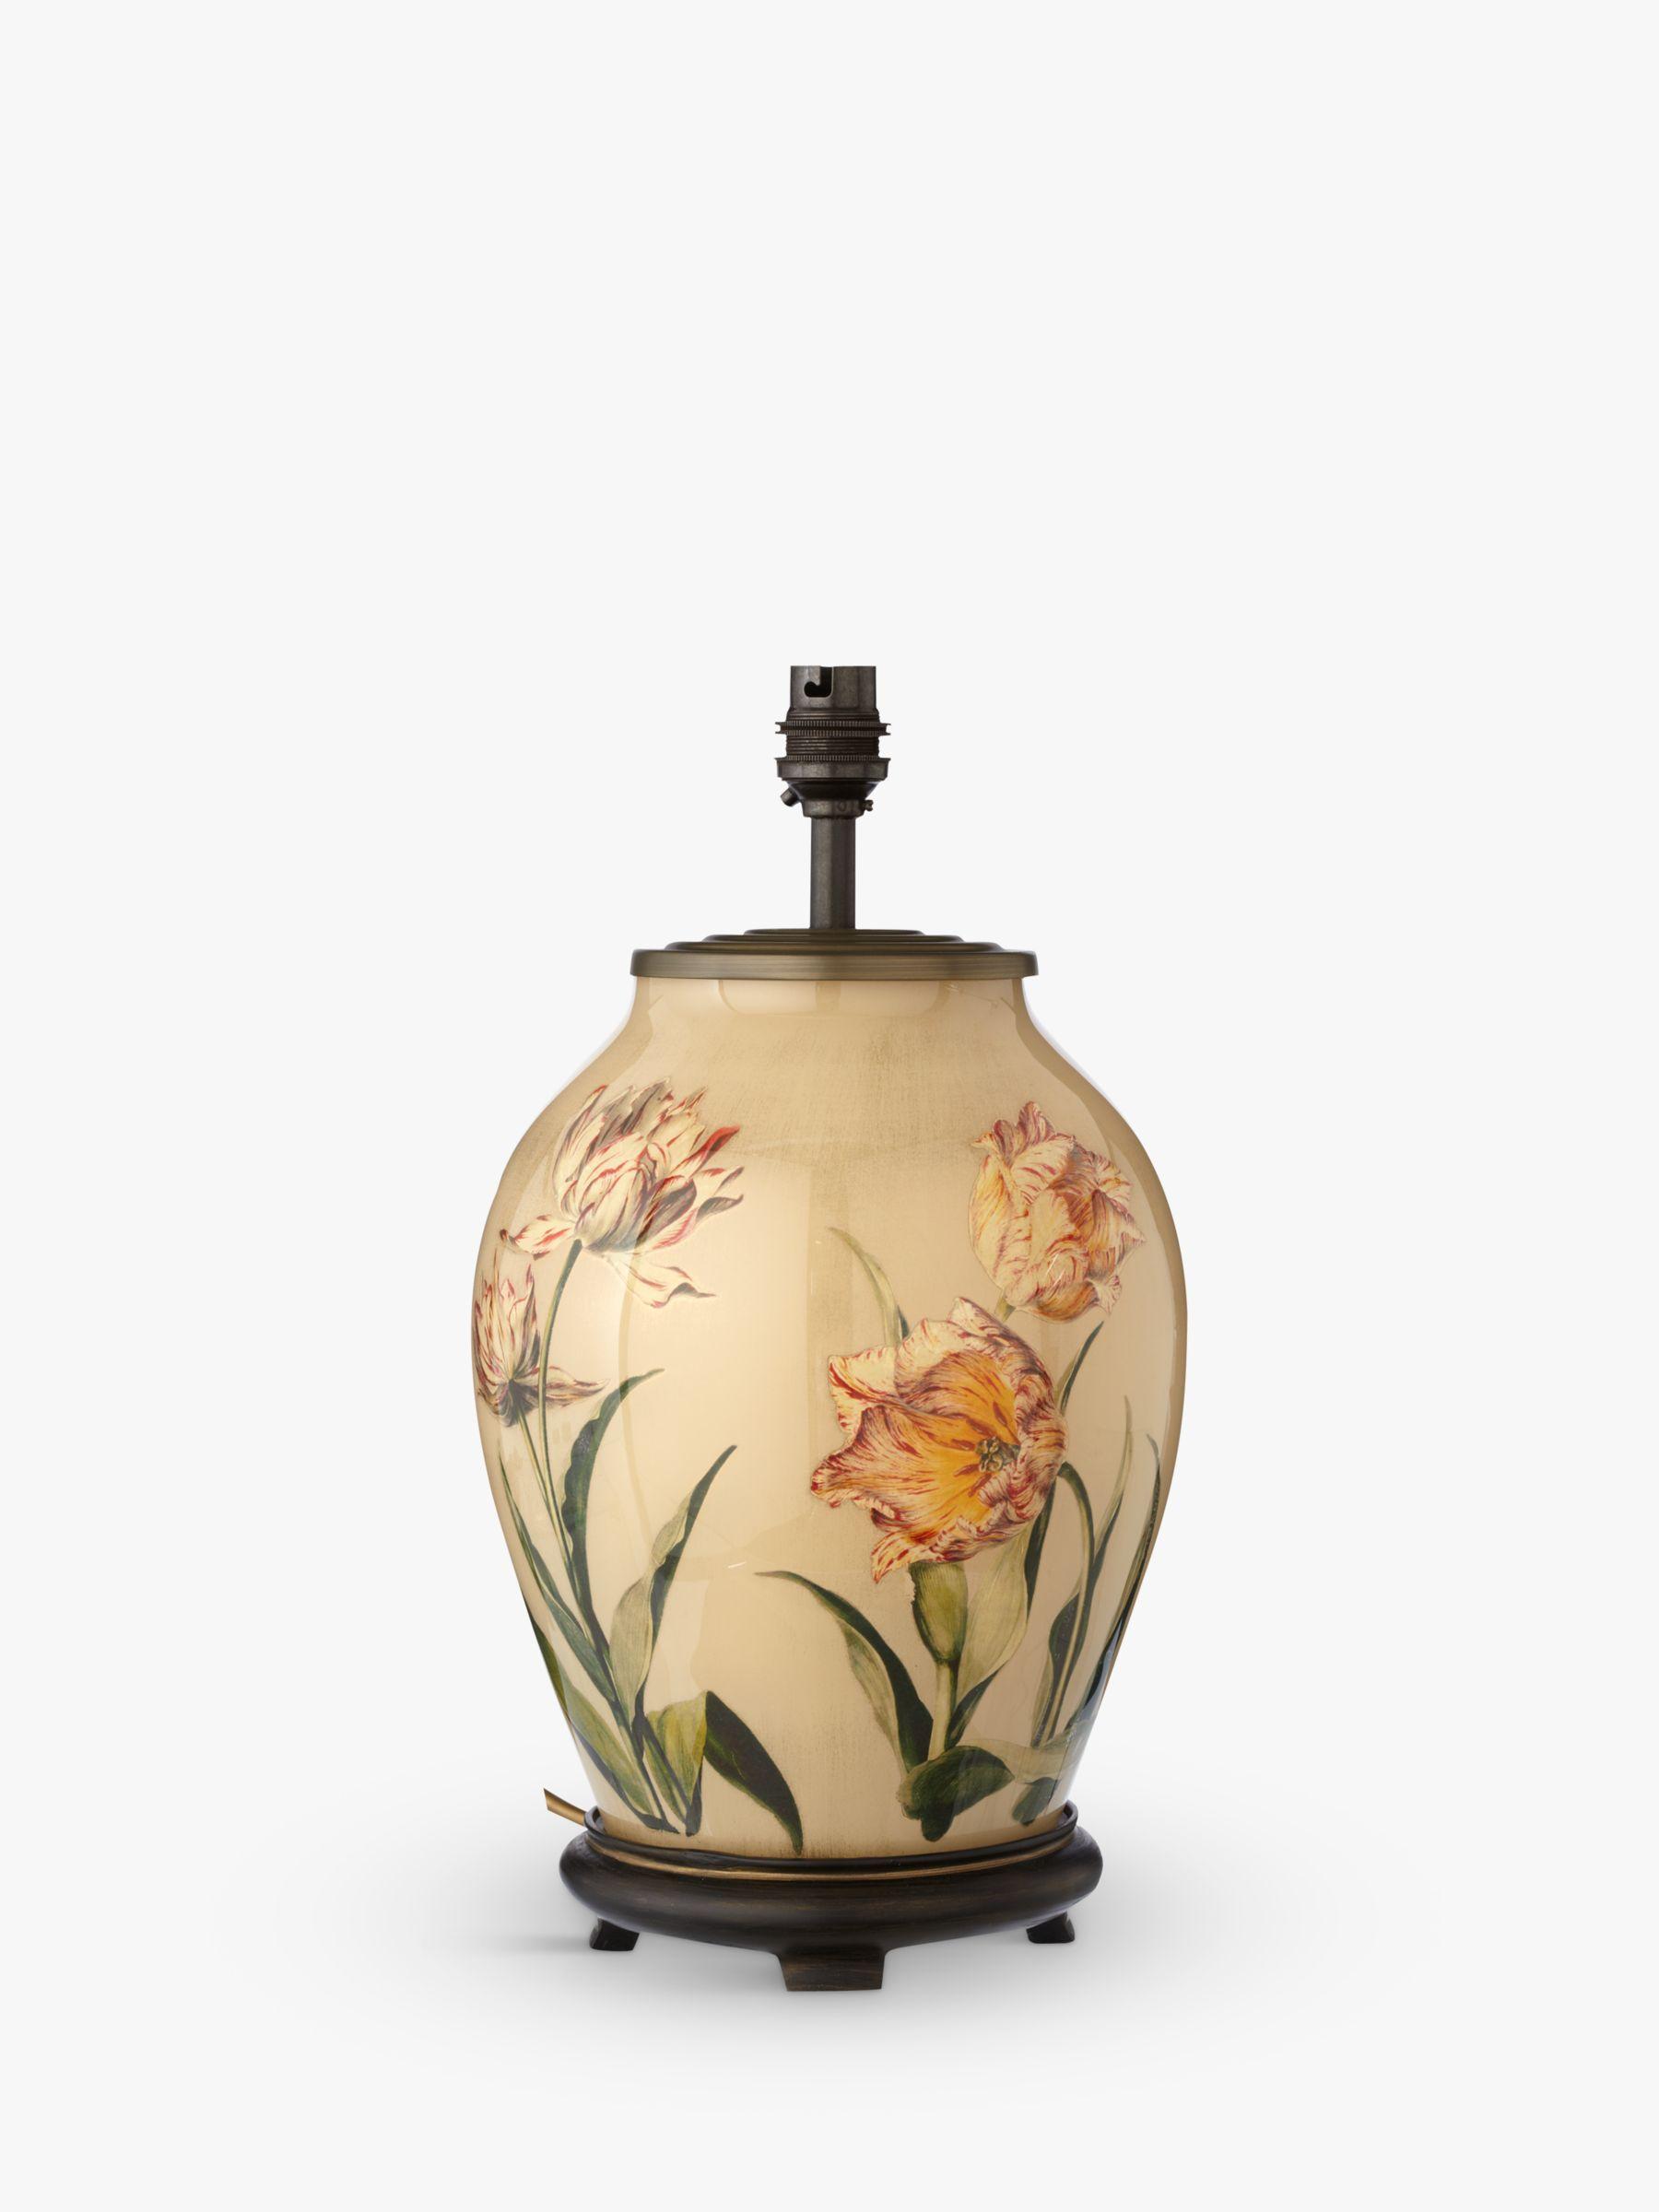 Jenny Worrall Jenny Worrall Sievert Tulip Small Glass Lamp Base, Multi, H37cm